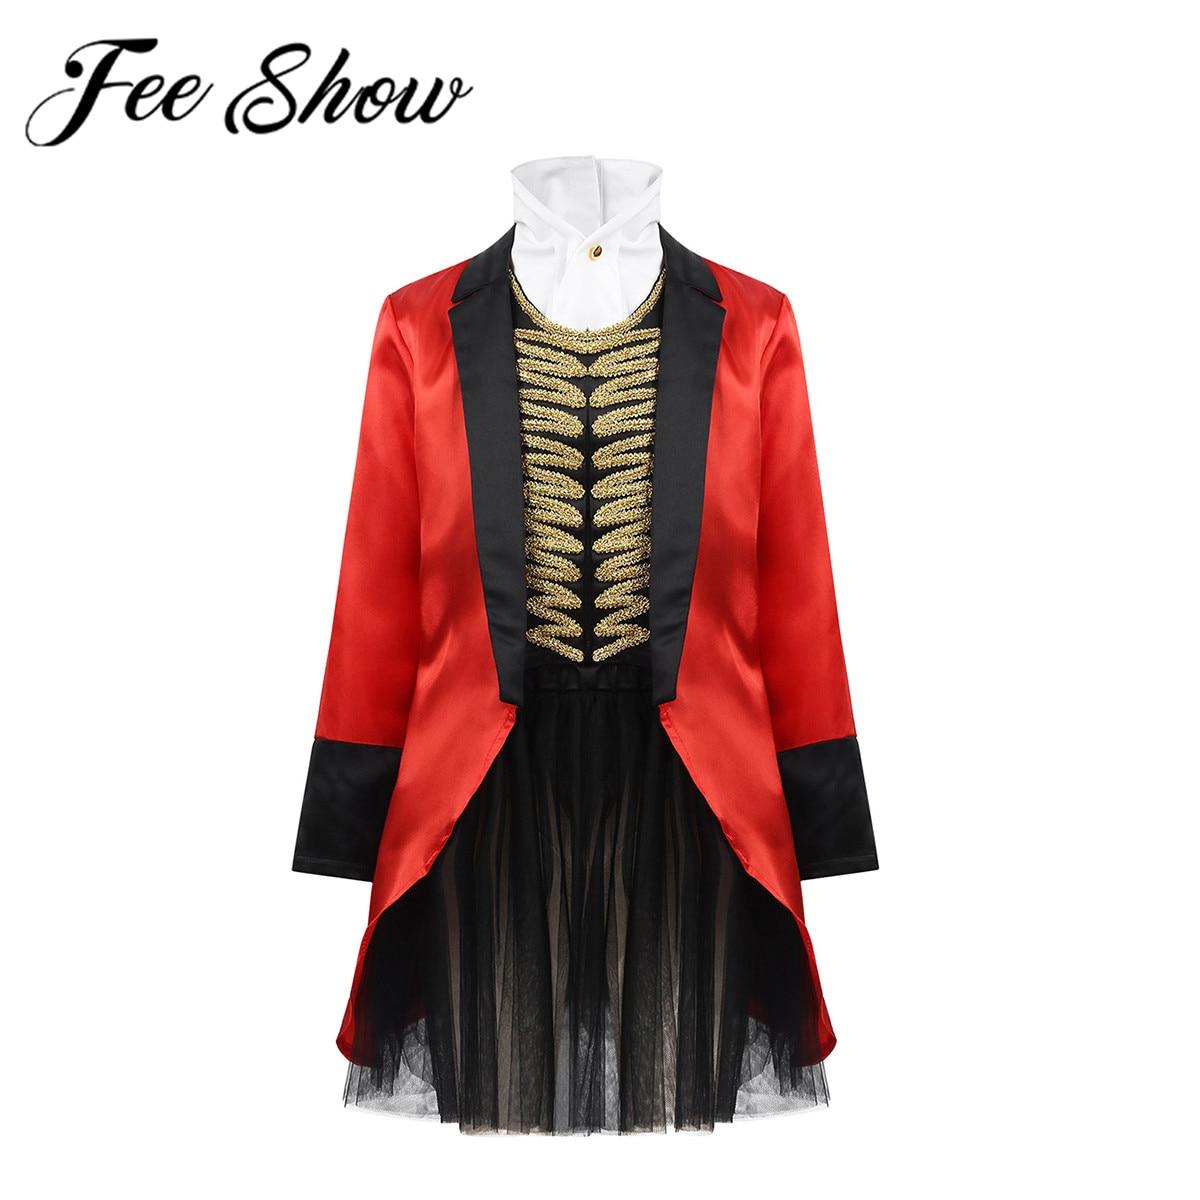 Cotton Gloves Magician Butler Halloween Adult Fancy Dress Costume Accessory